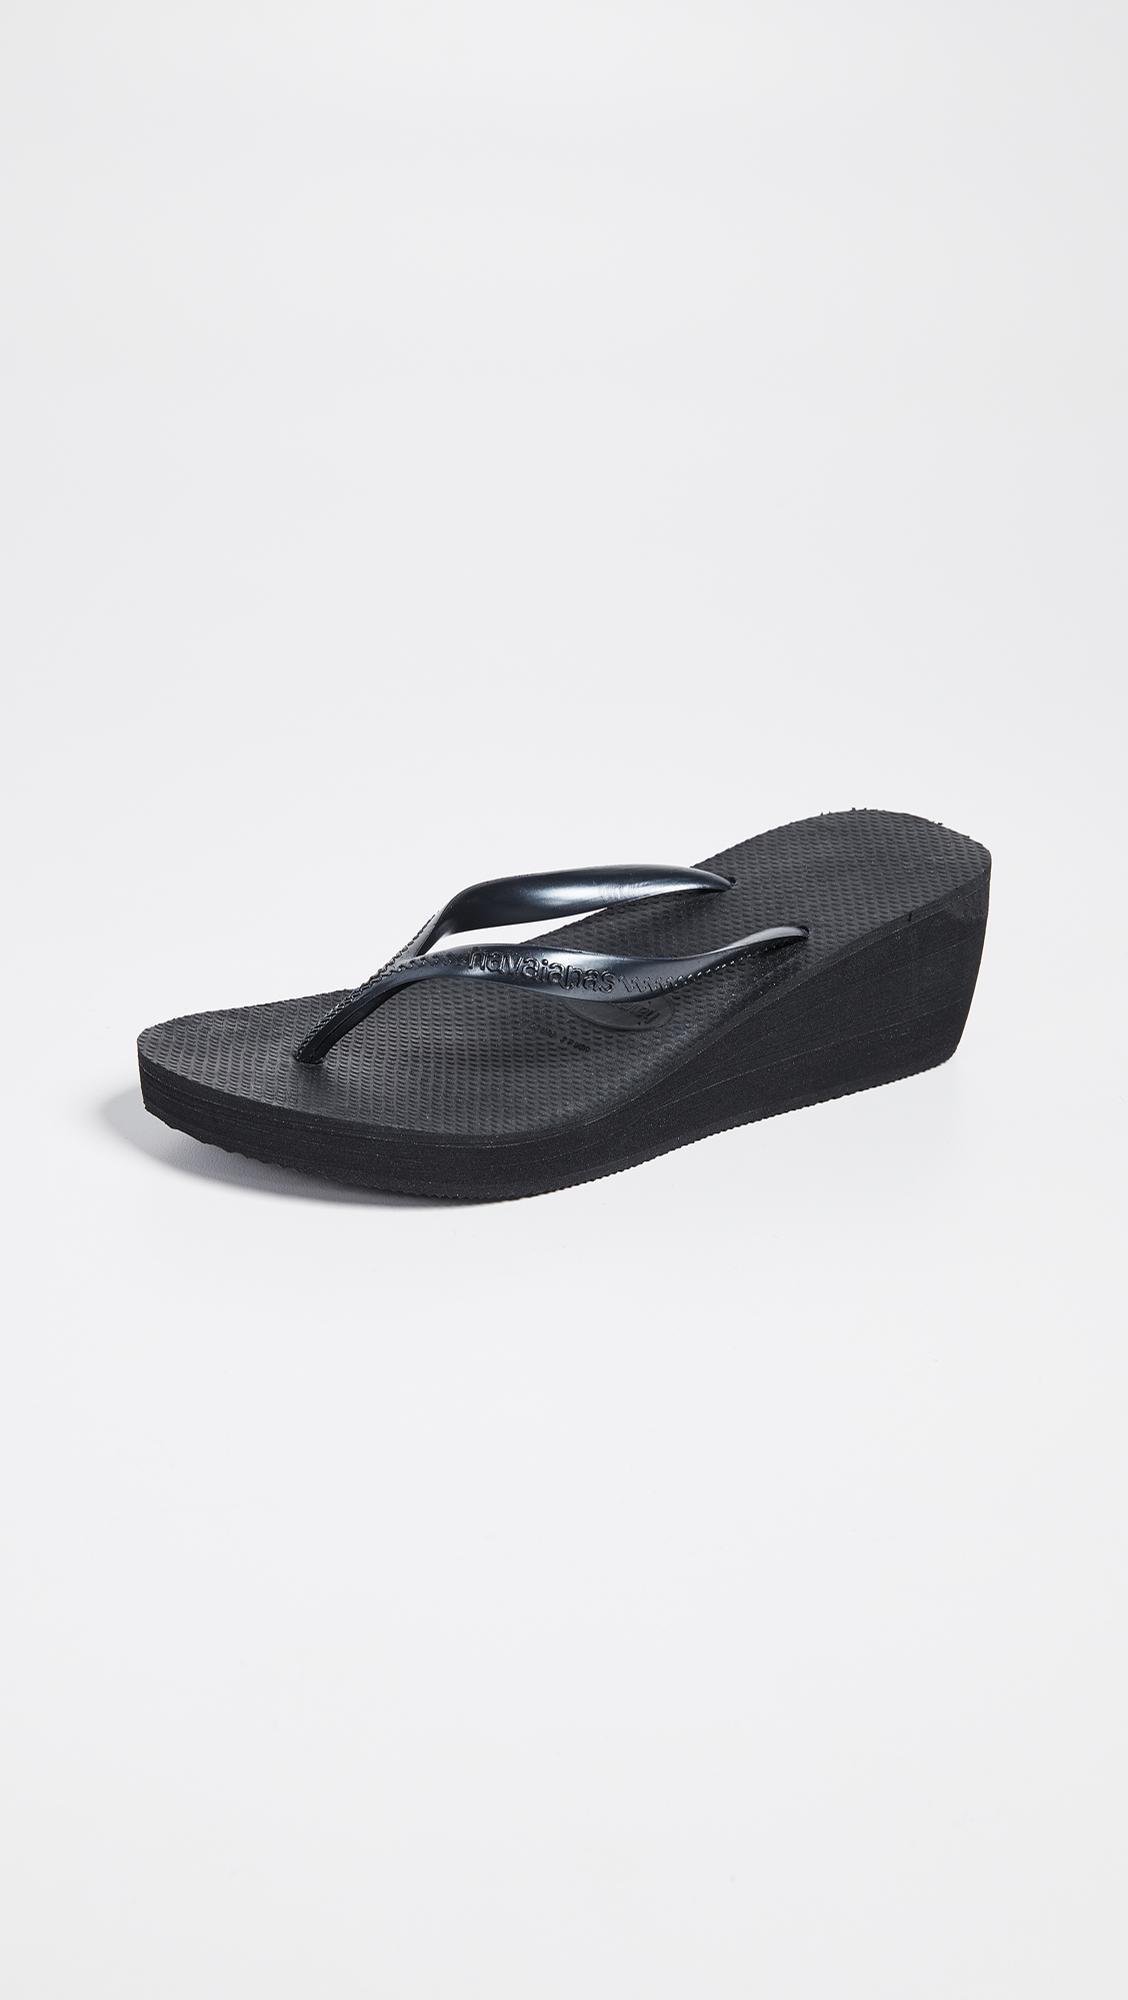 Havaianas High Fashion Wedge Flip Flops In Metallic Lyst